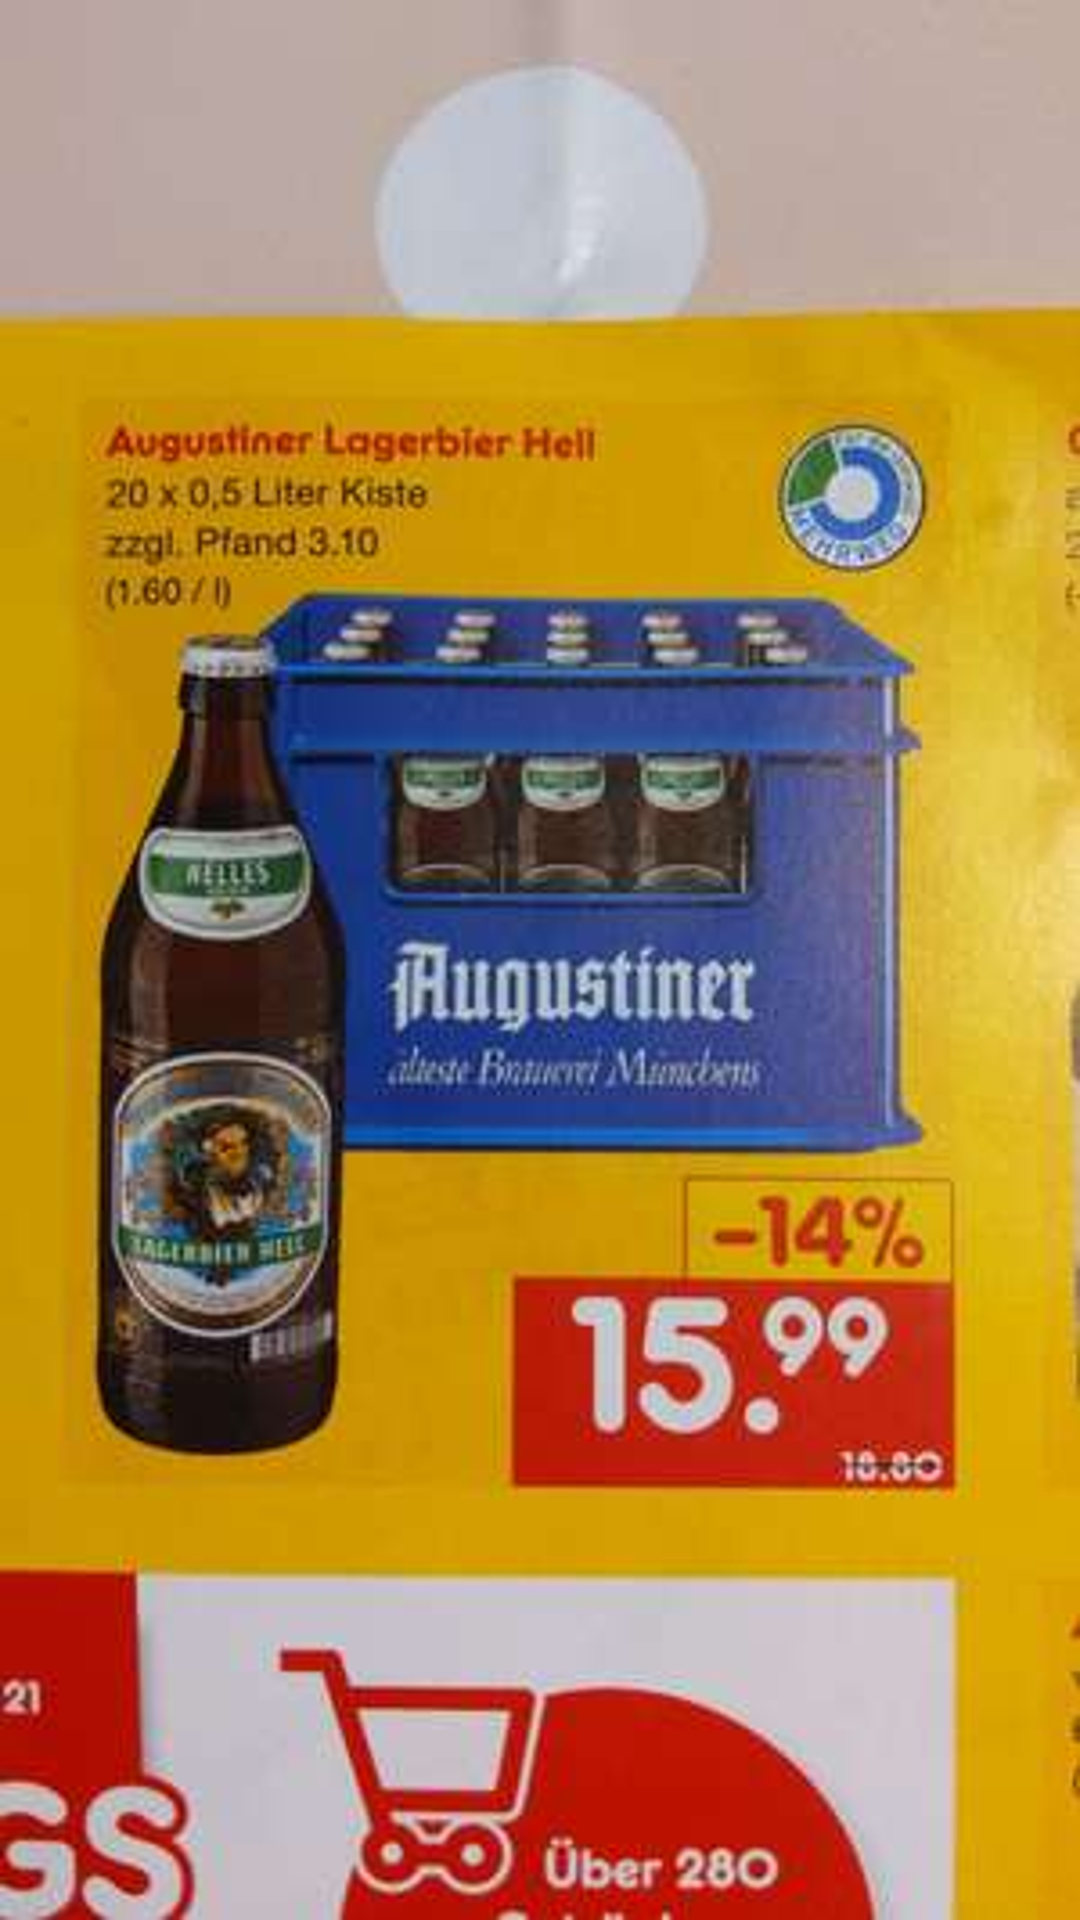 [Netto Getränke-Discount - Lokal Berlin] Augustiner Lagerbier Hell